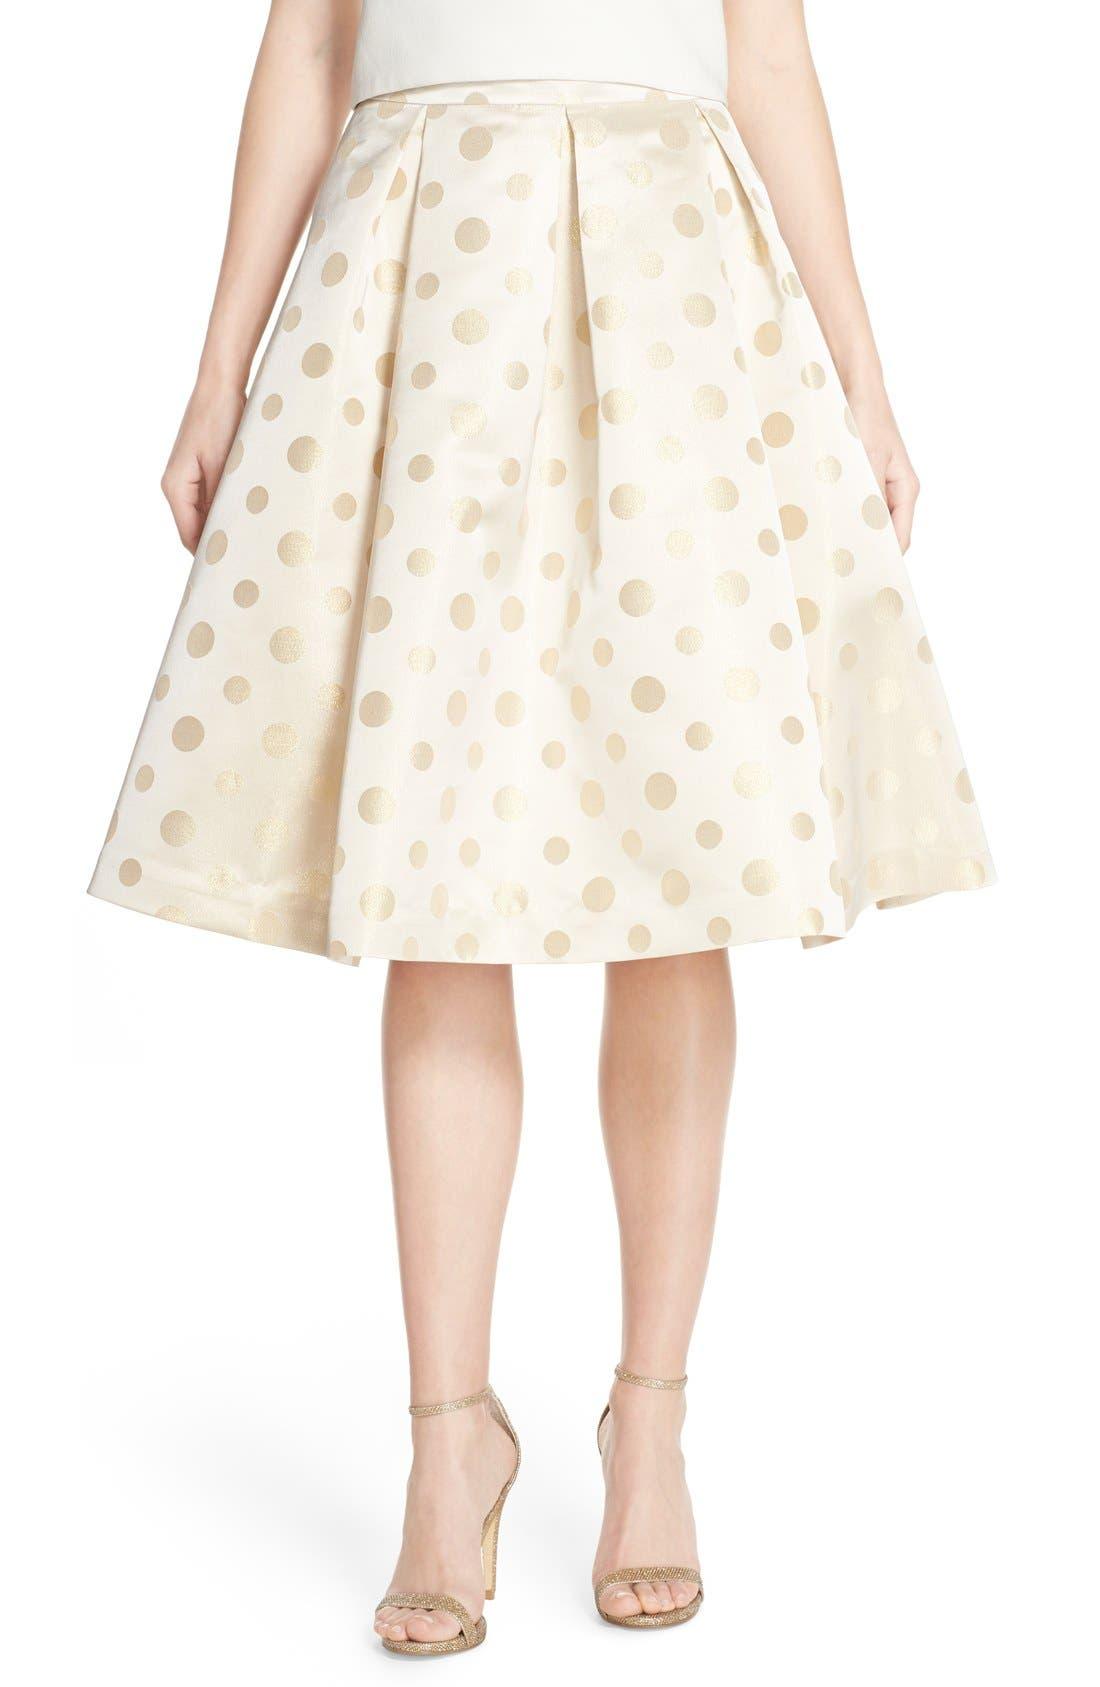 Alternate Image 1 Selected - Eliza J Polka Dot Metallic Midi Skirt